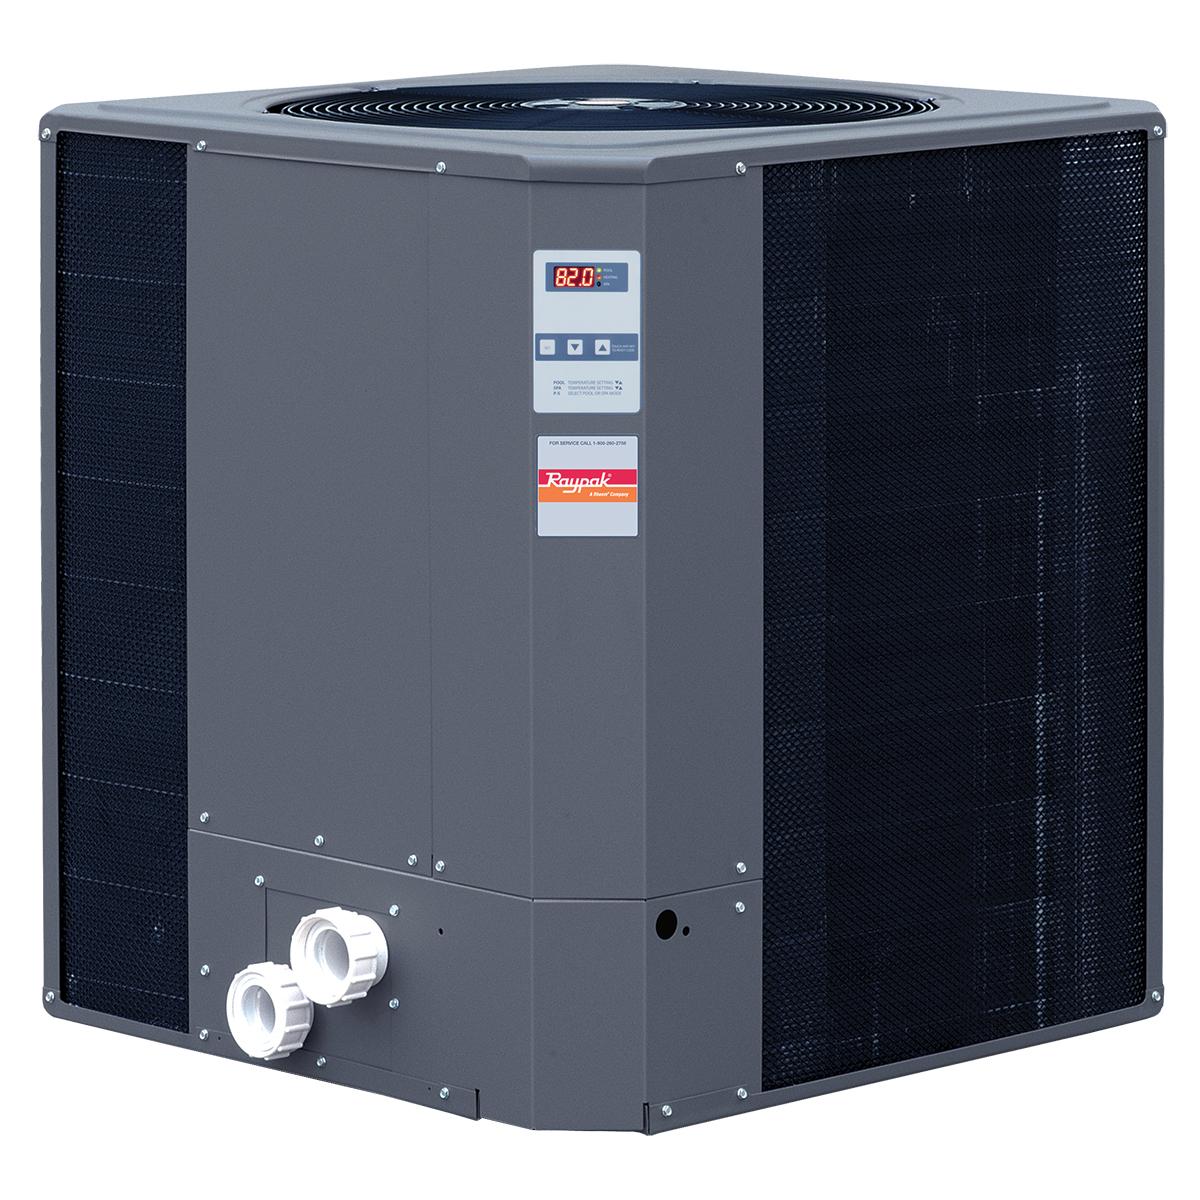 Raypak R6450ti-E 119,000 BTU Heat Pump Digital Titanium